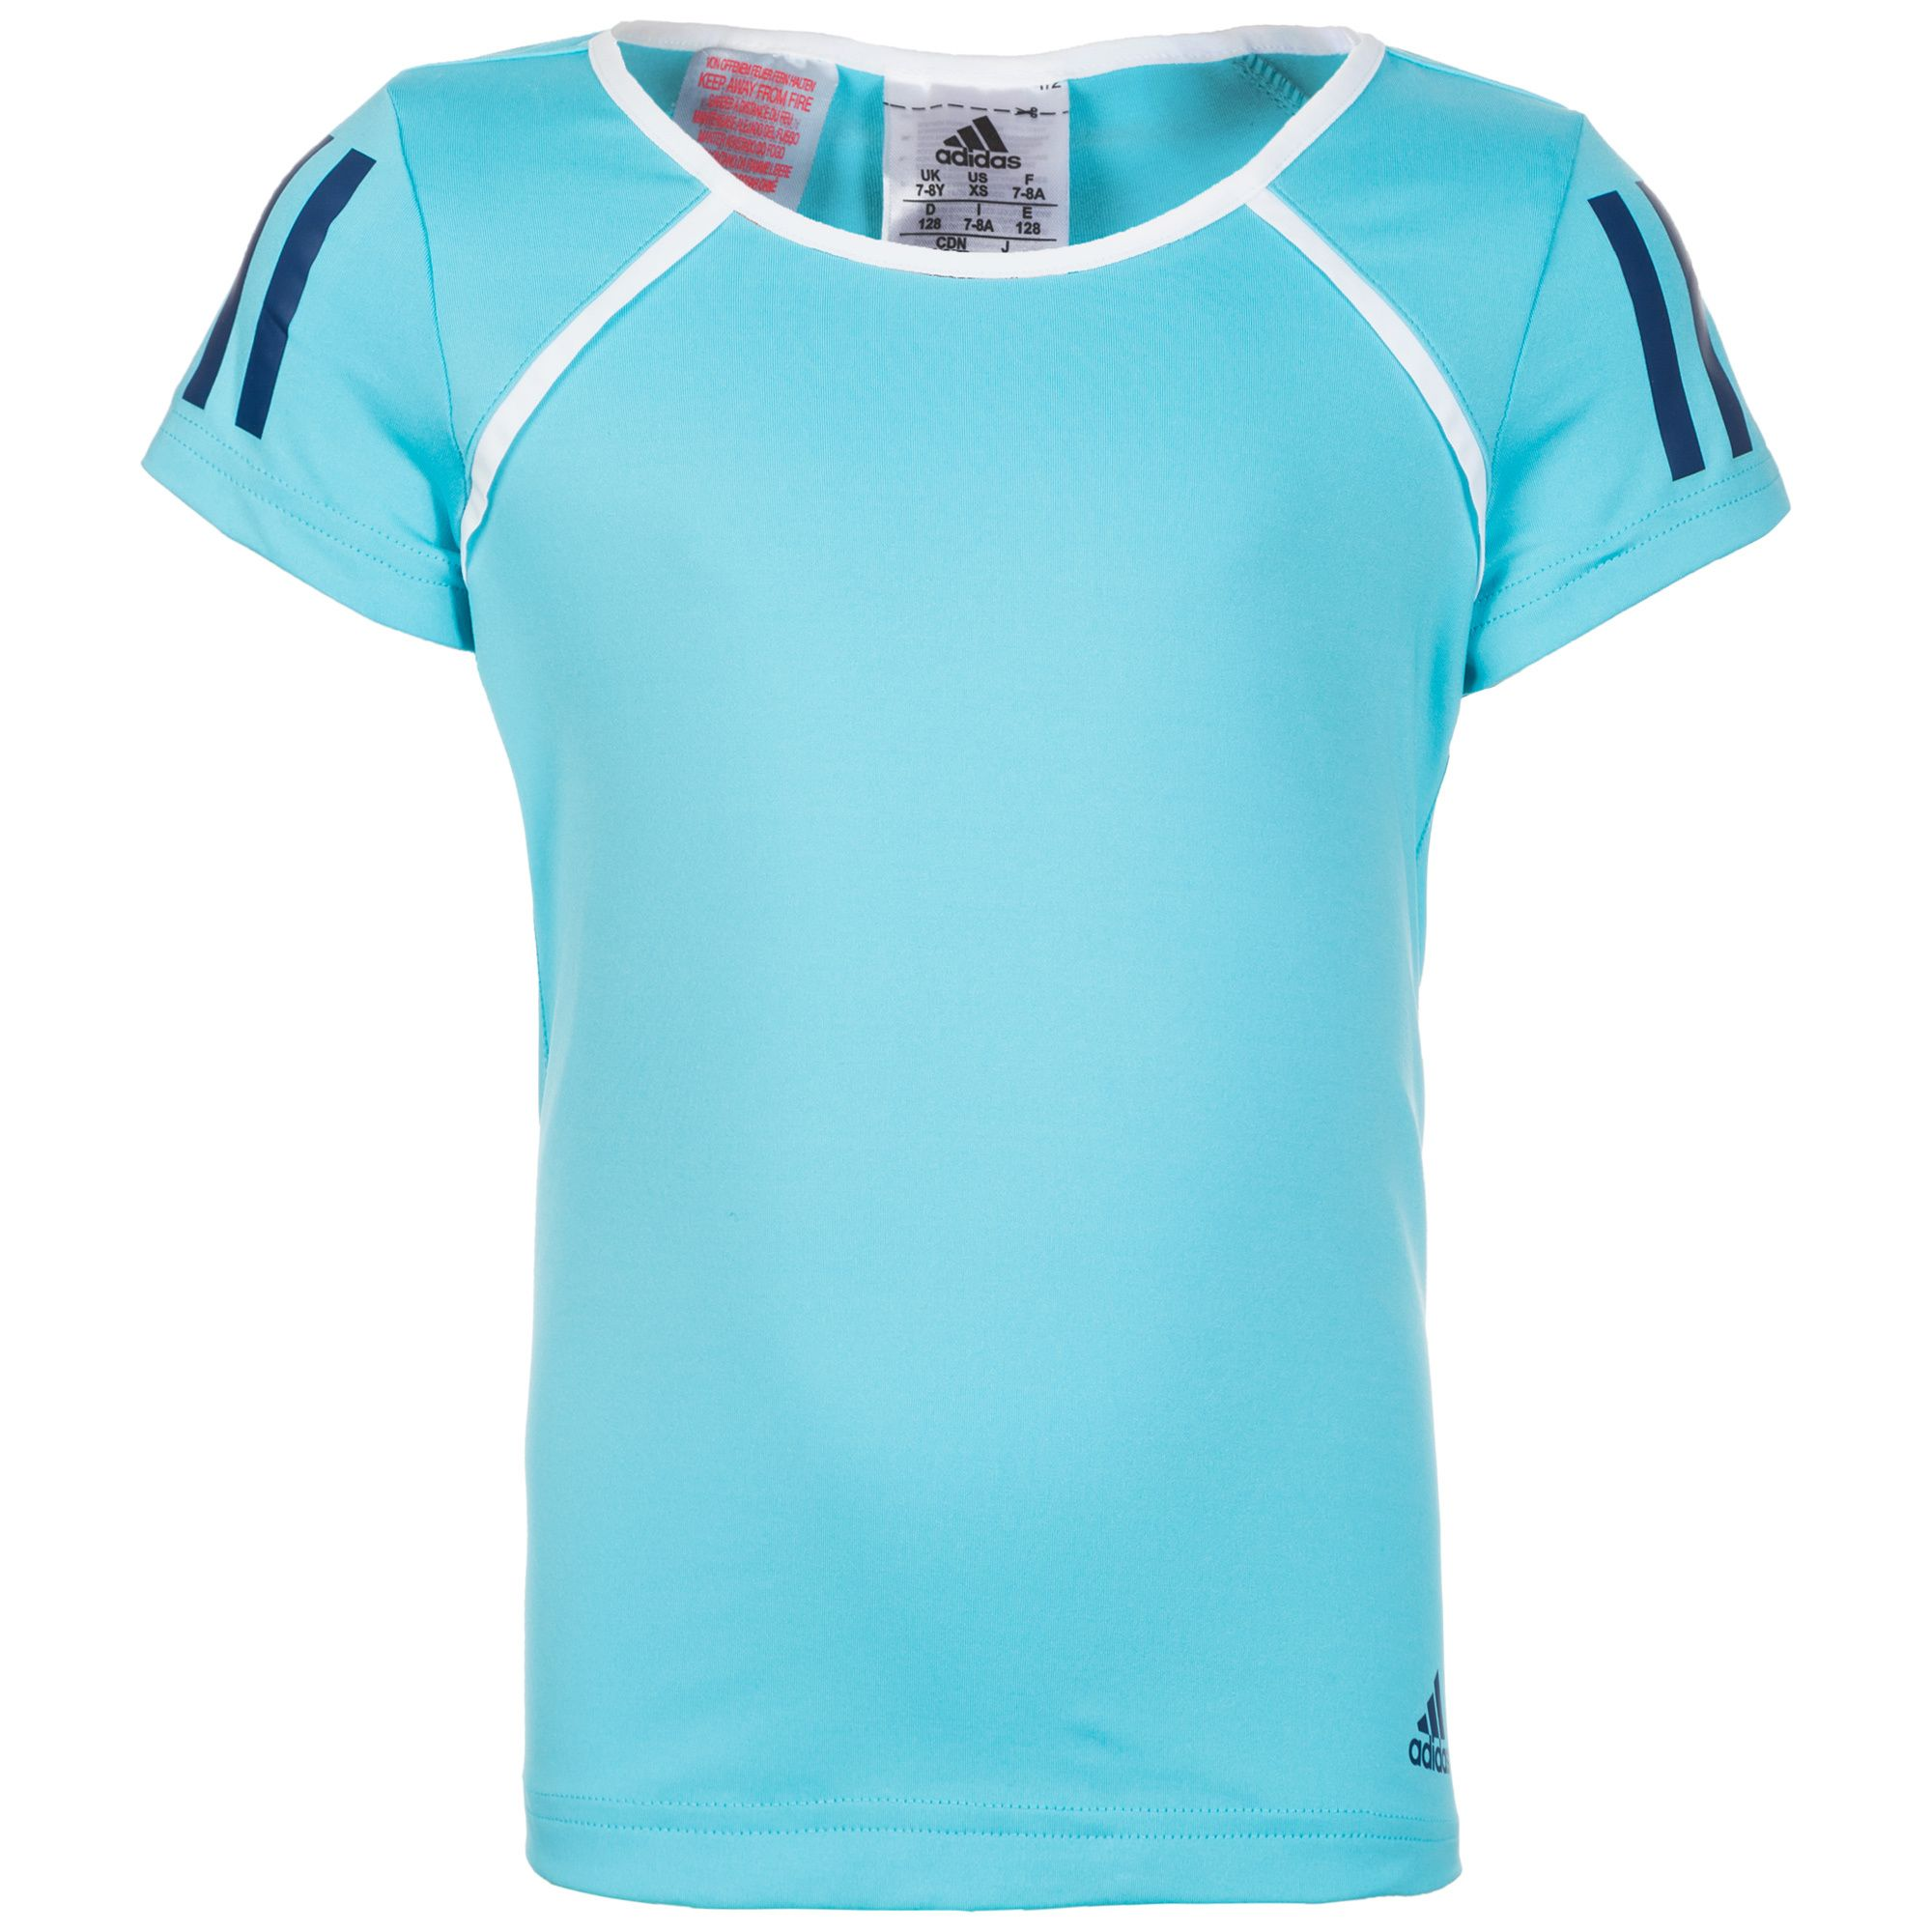 ADIDAS PERFORMANCE adidas Performance Club Tennisshirt Kinder